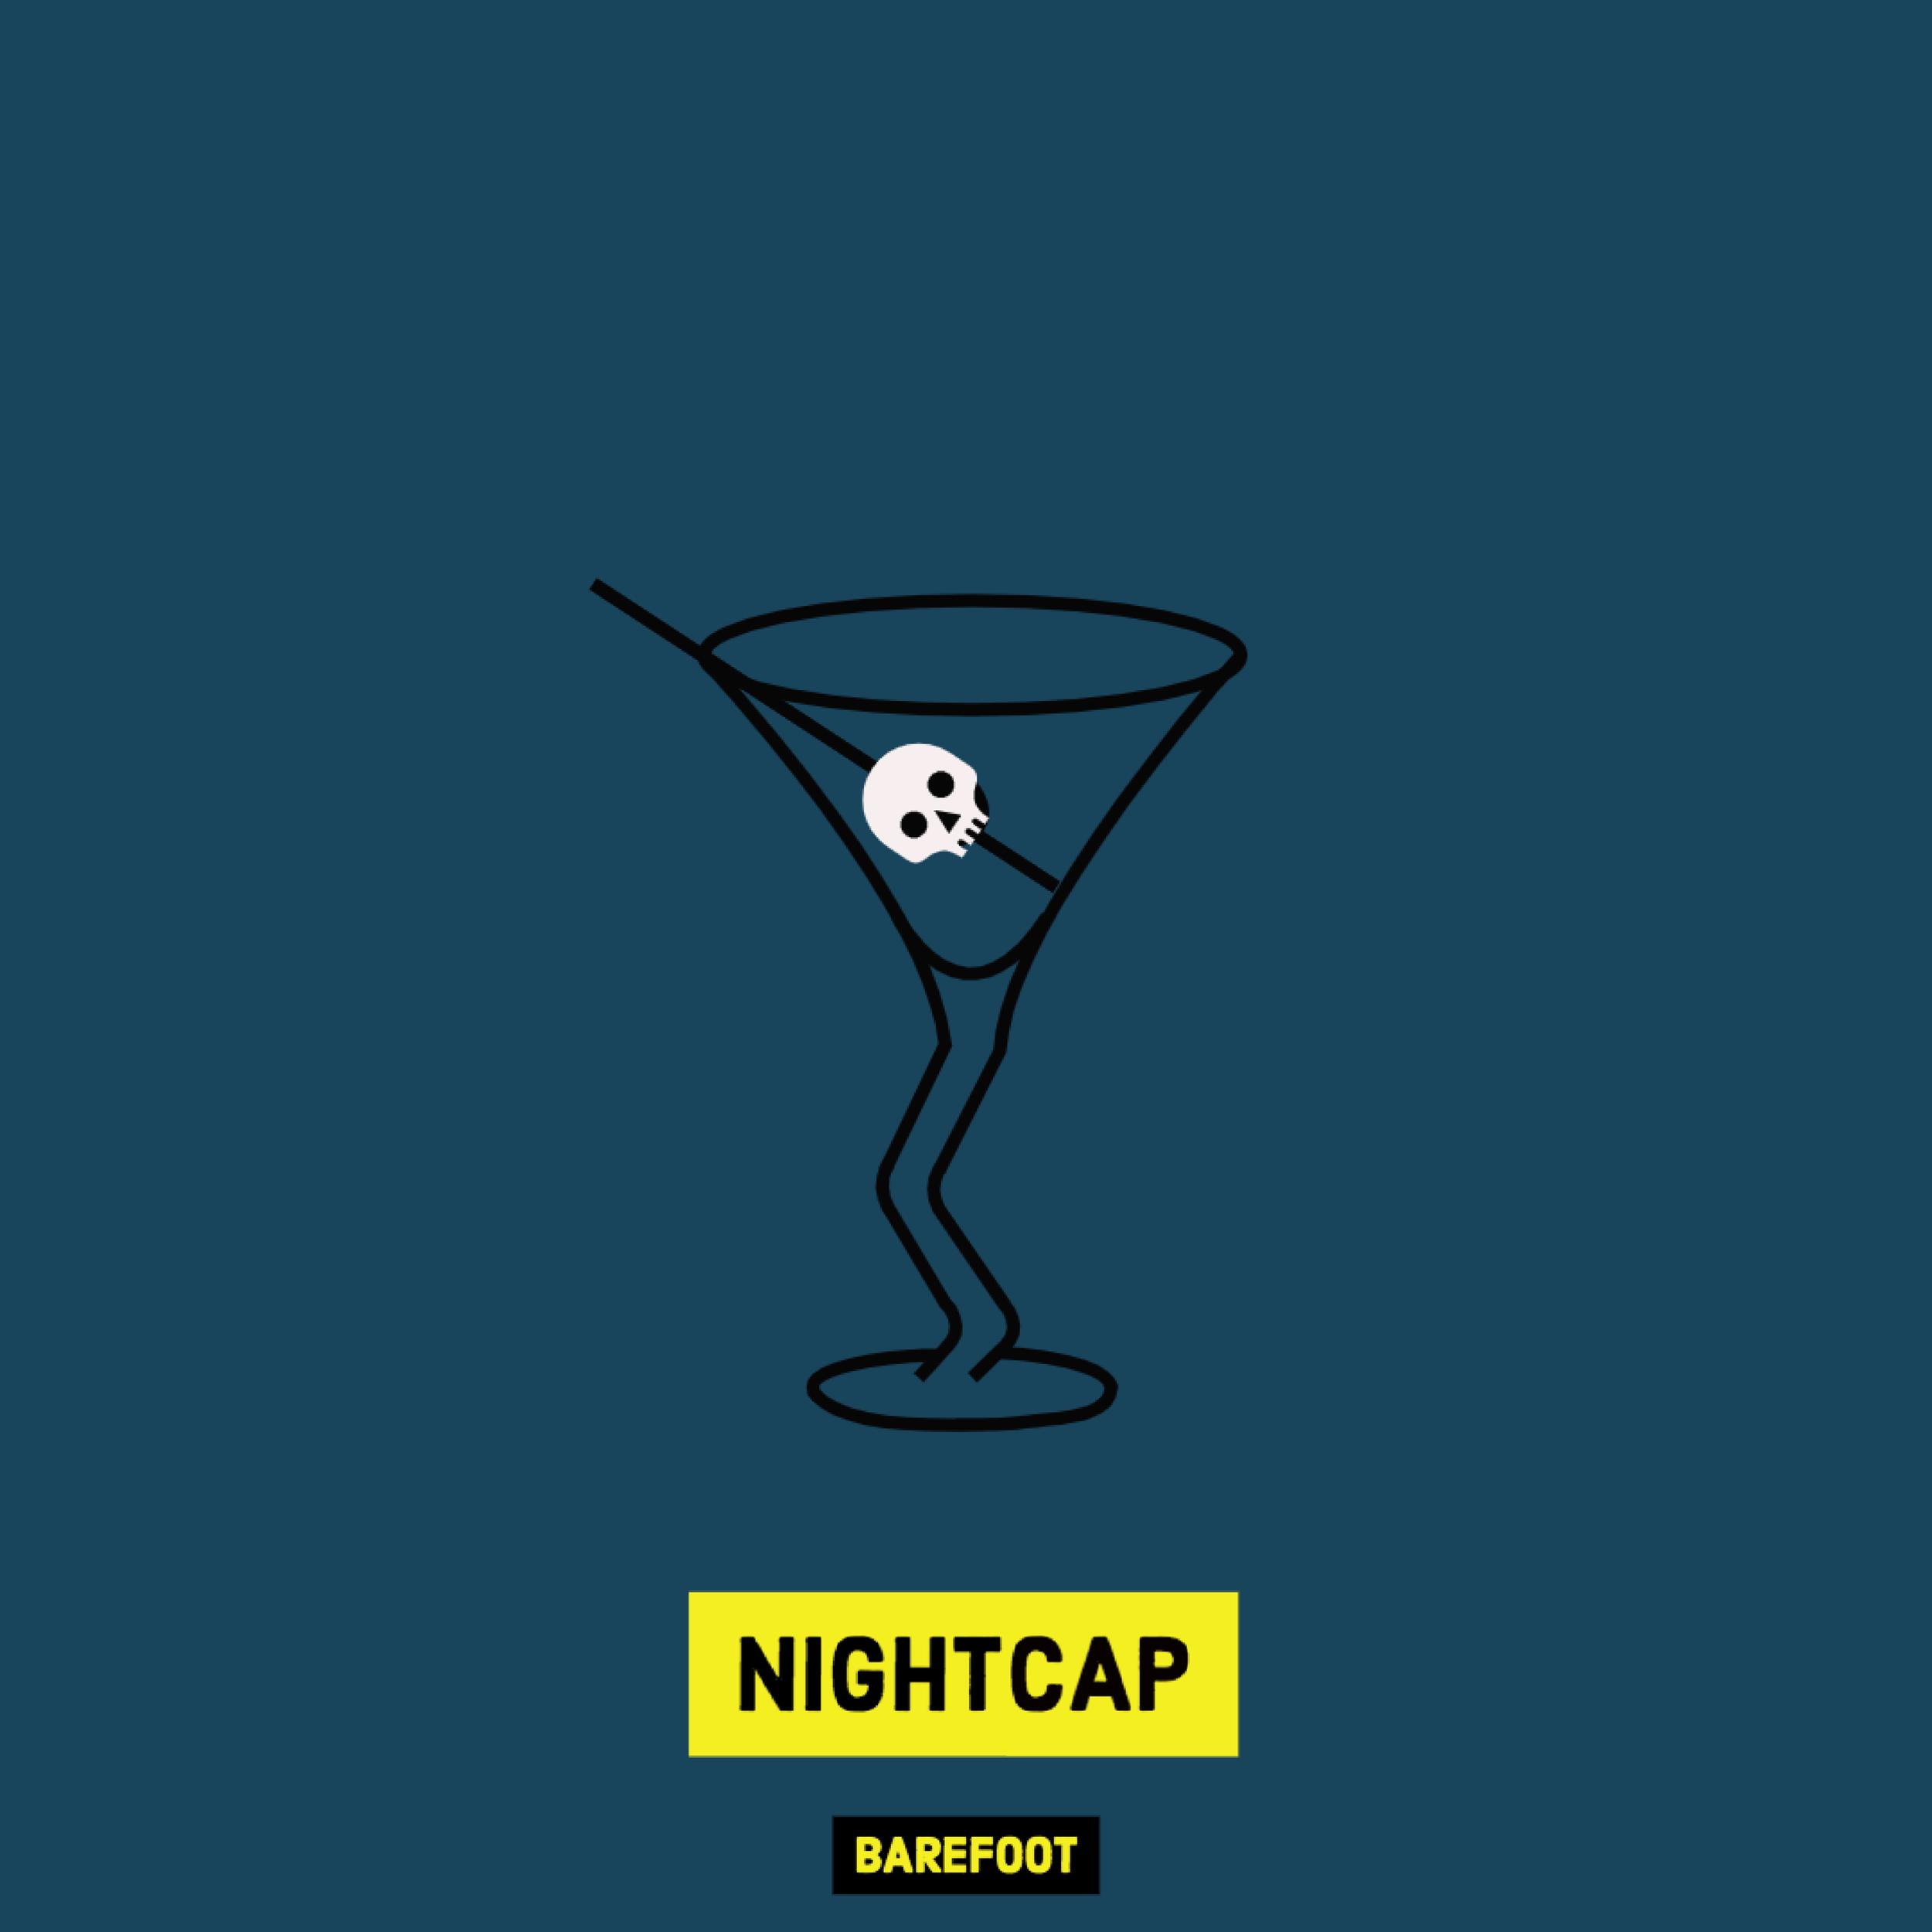 nightcap fixed-01.png